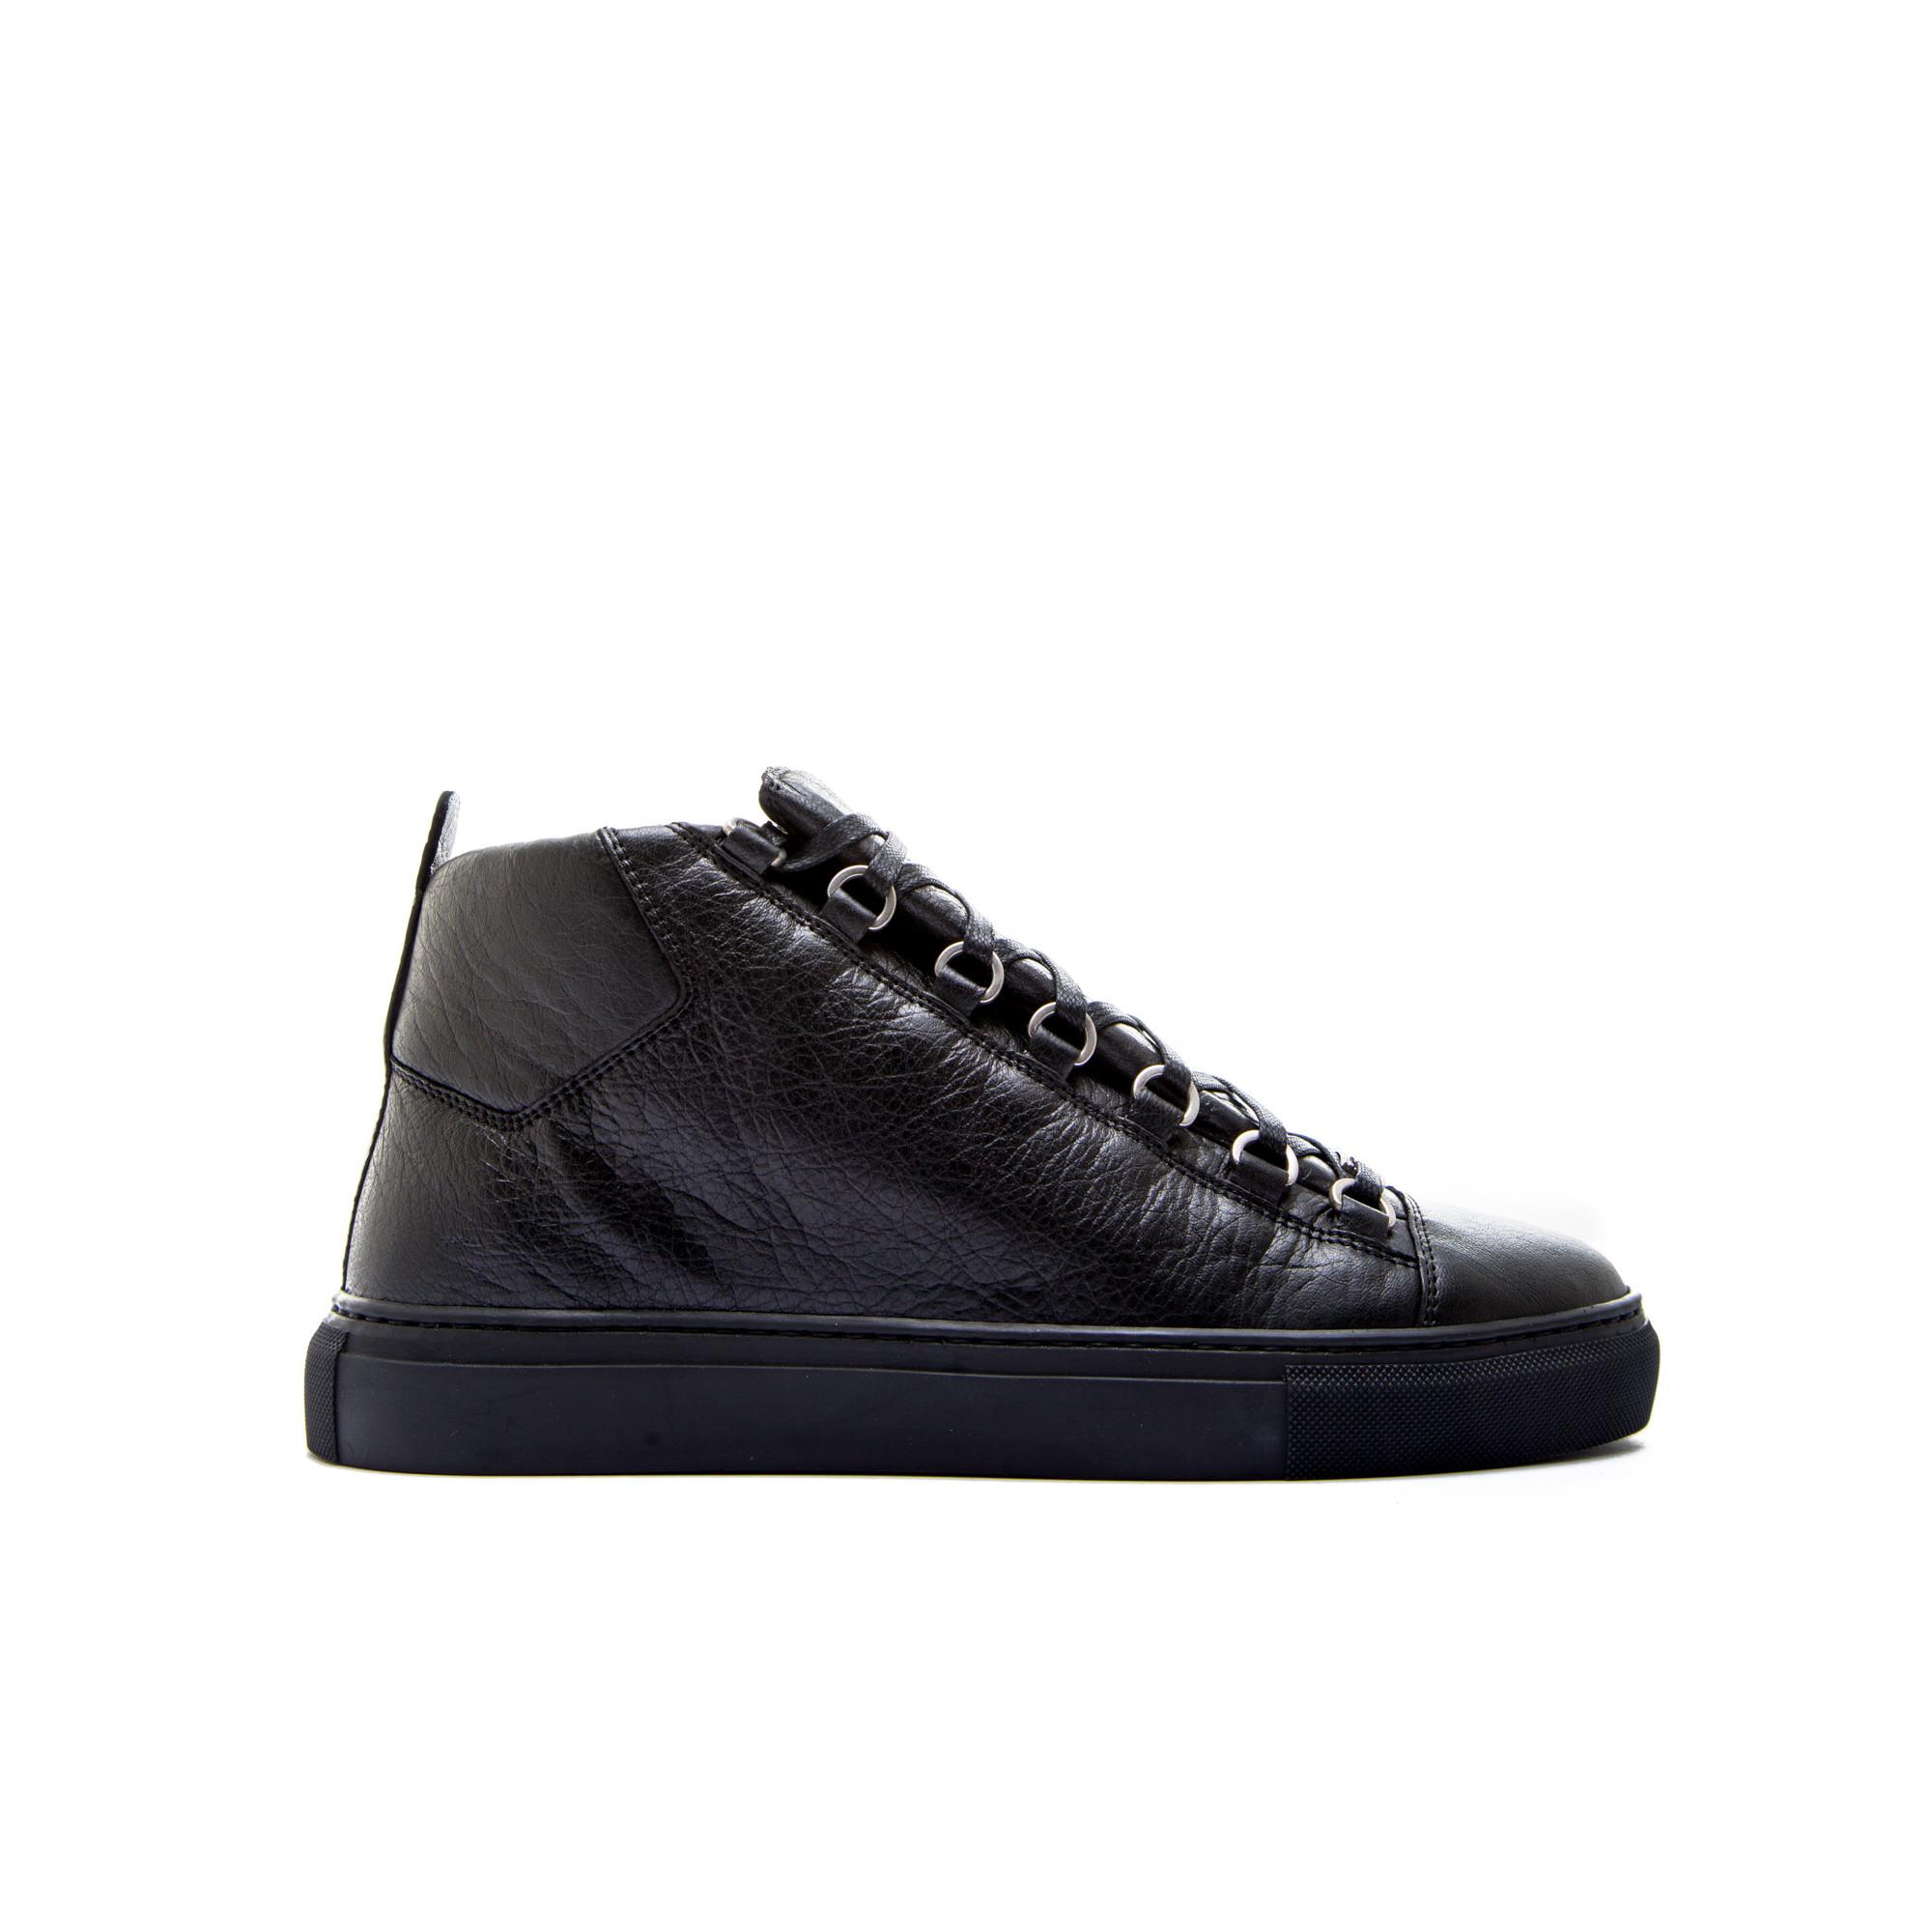 balenciaga sport shoes black. Black Bedroom Furniture Sets. Home Design Ideas